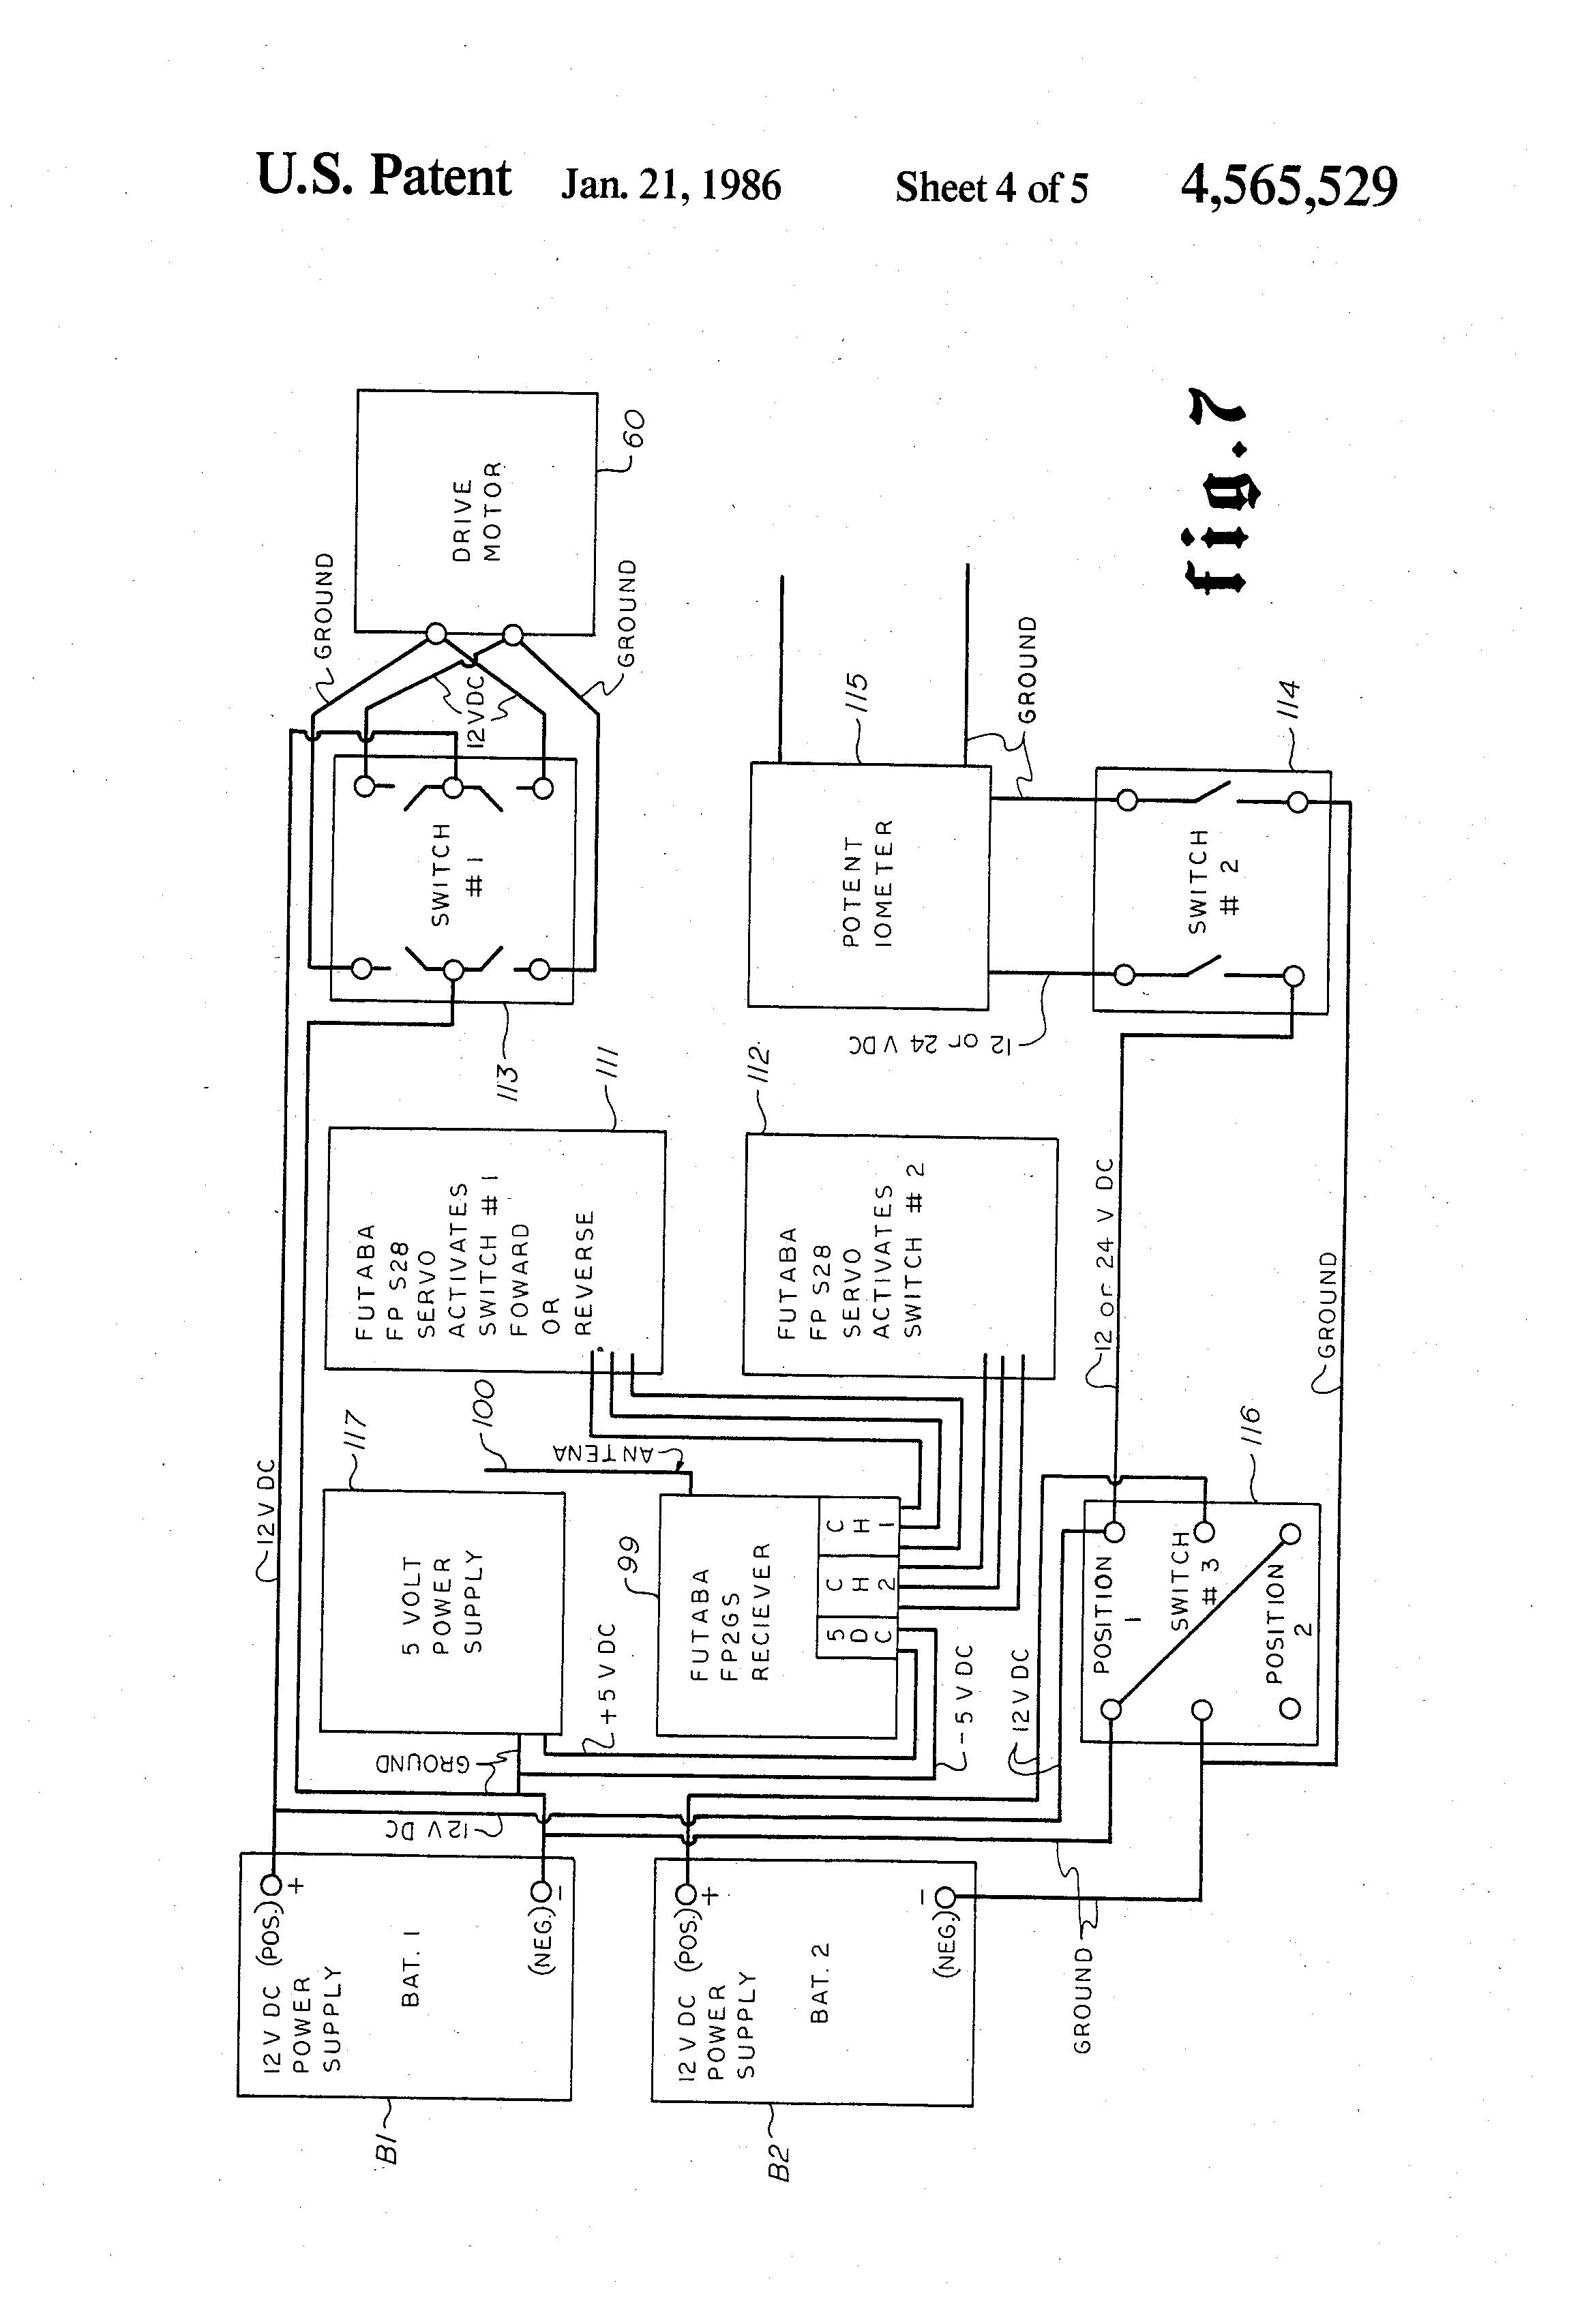 taylor dunn gas wiring diagram yamaha - wiring diagram all miss-withdraw -  miss-withdraw.huevoprint.it  huevoprint